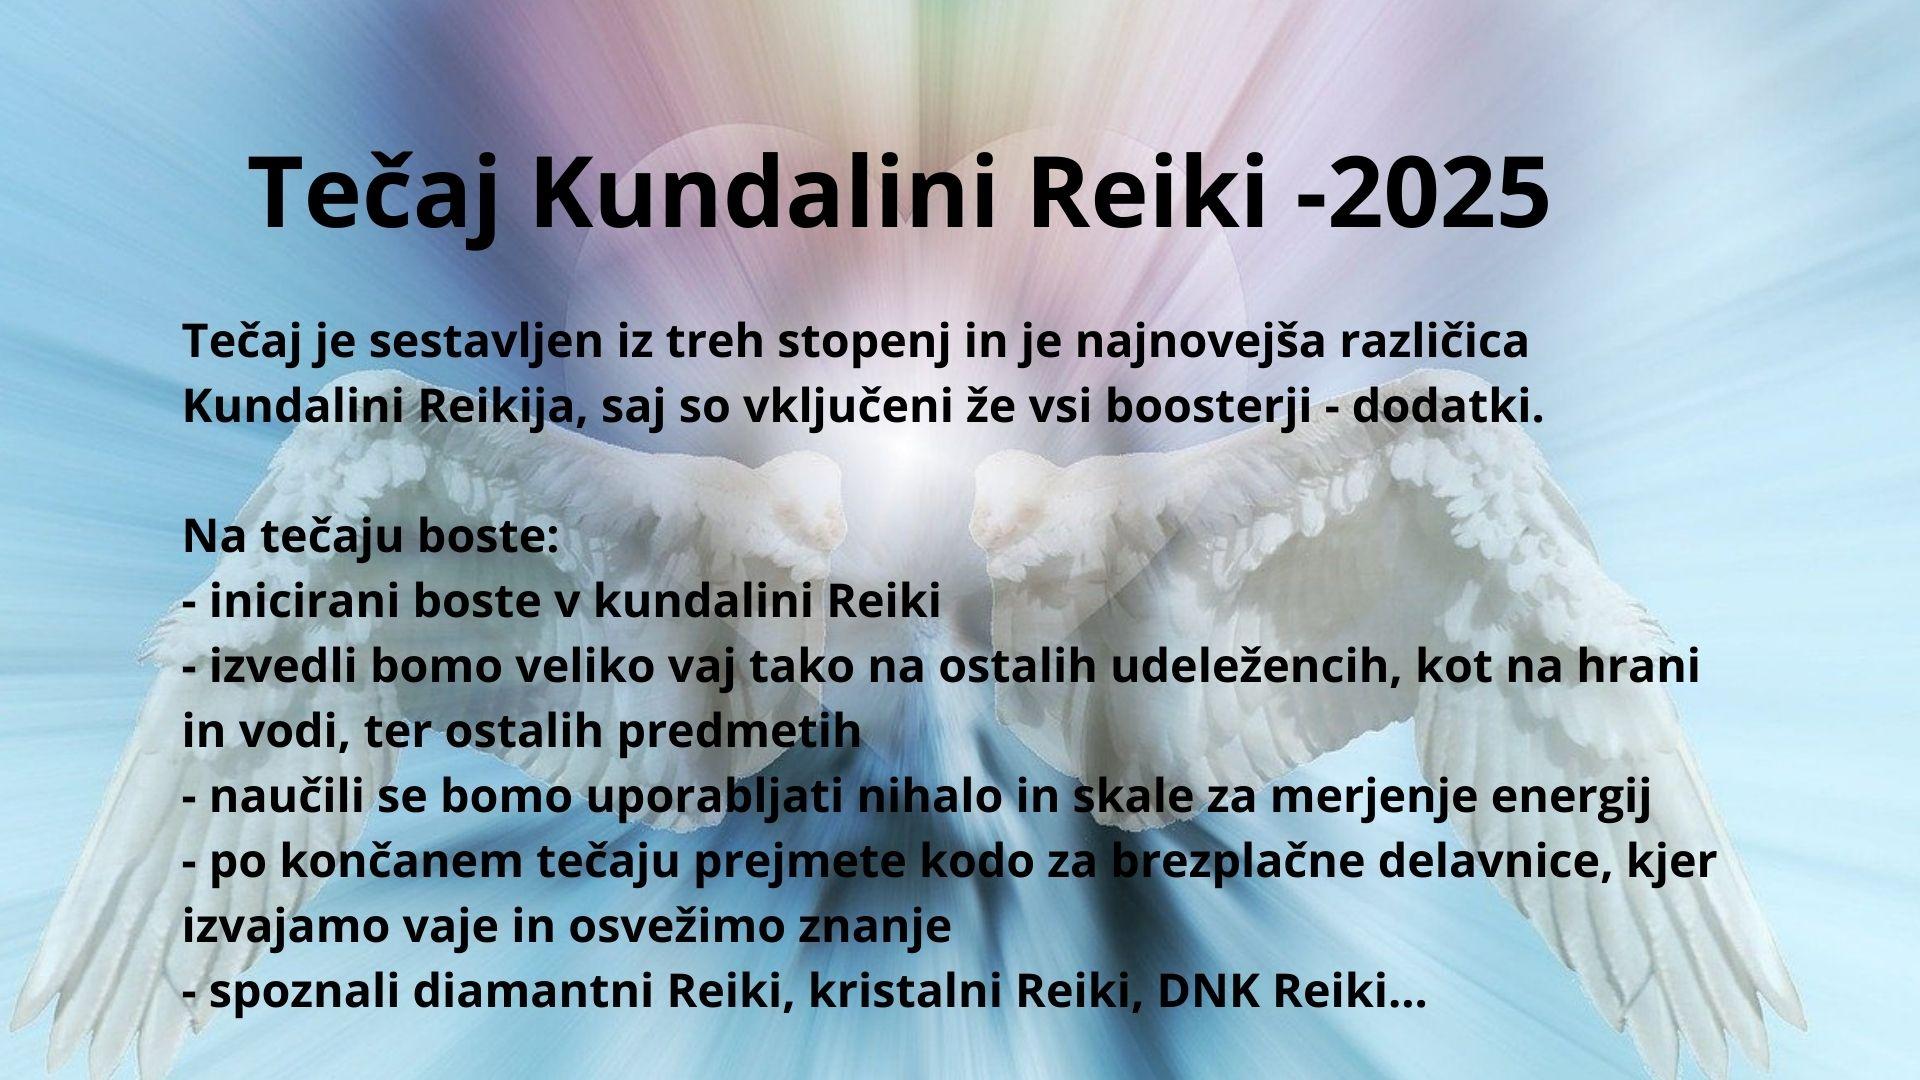 Tečaj Kundalini Reiki 1. stopnja 8